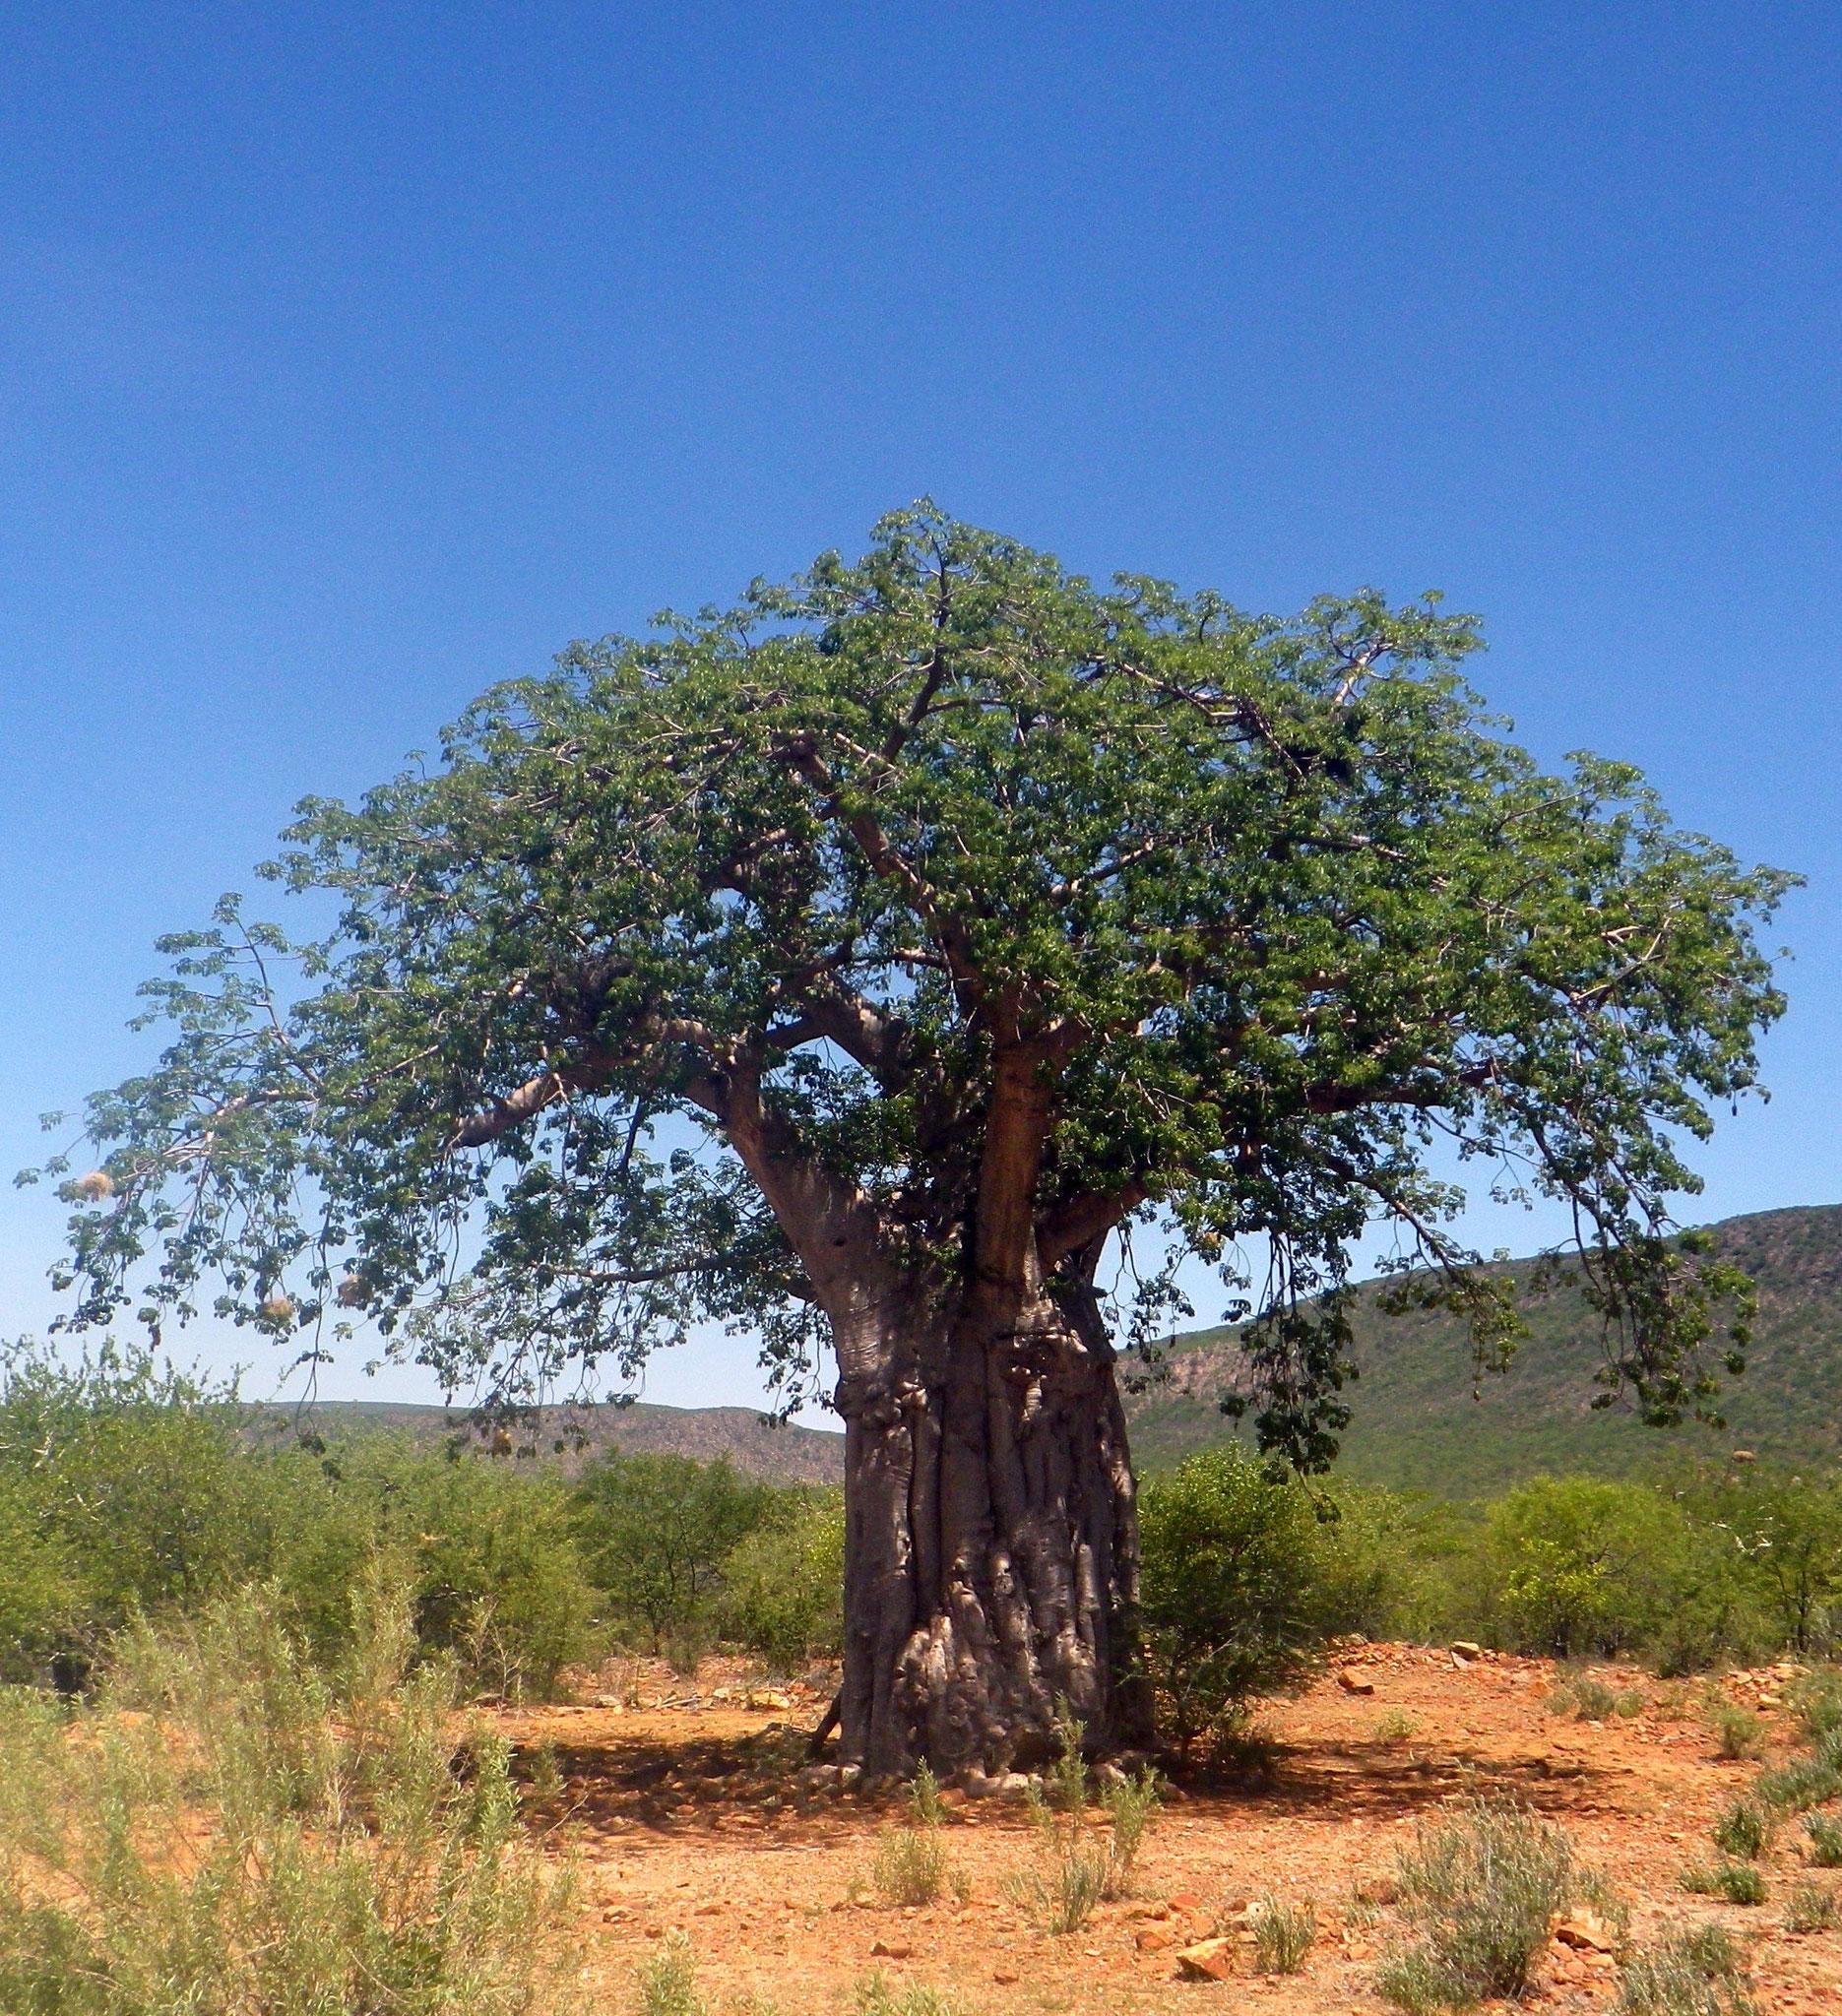 Namibia: roter Sand, grüne Blätter, blauer Himmel